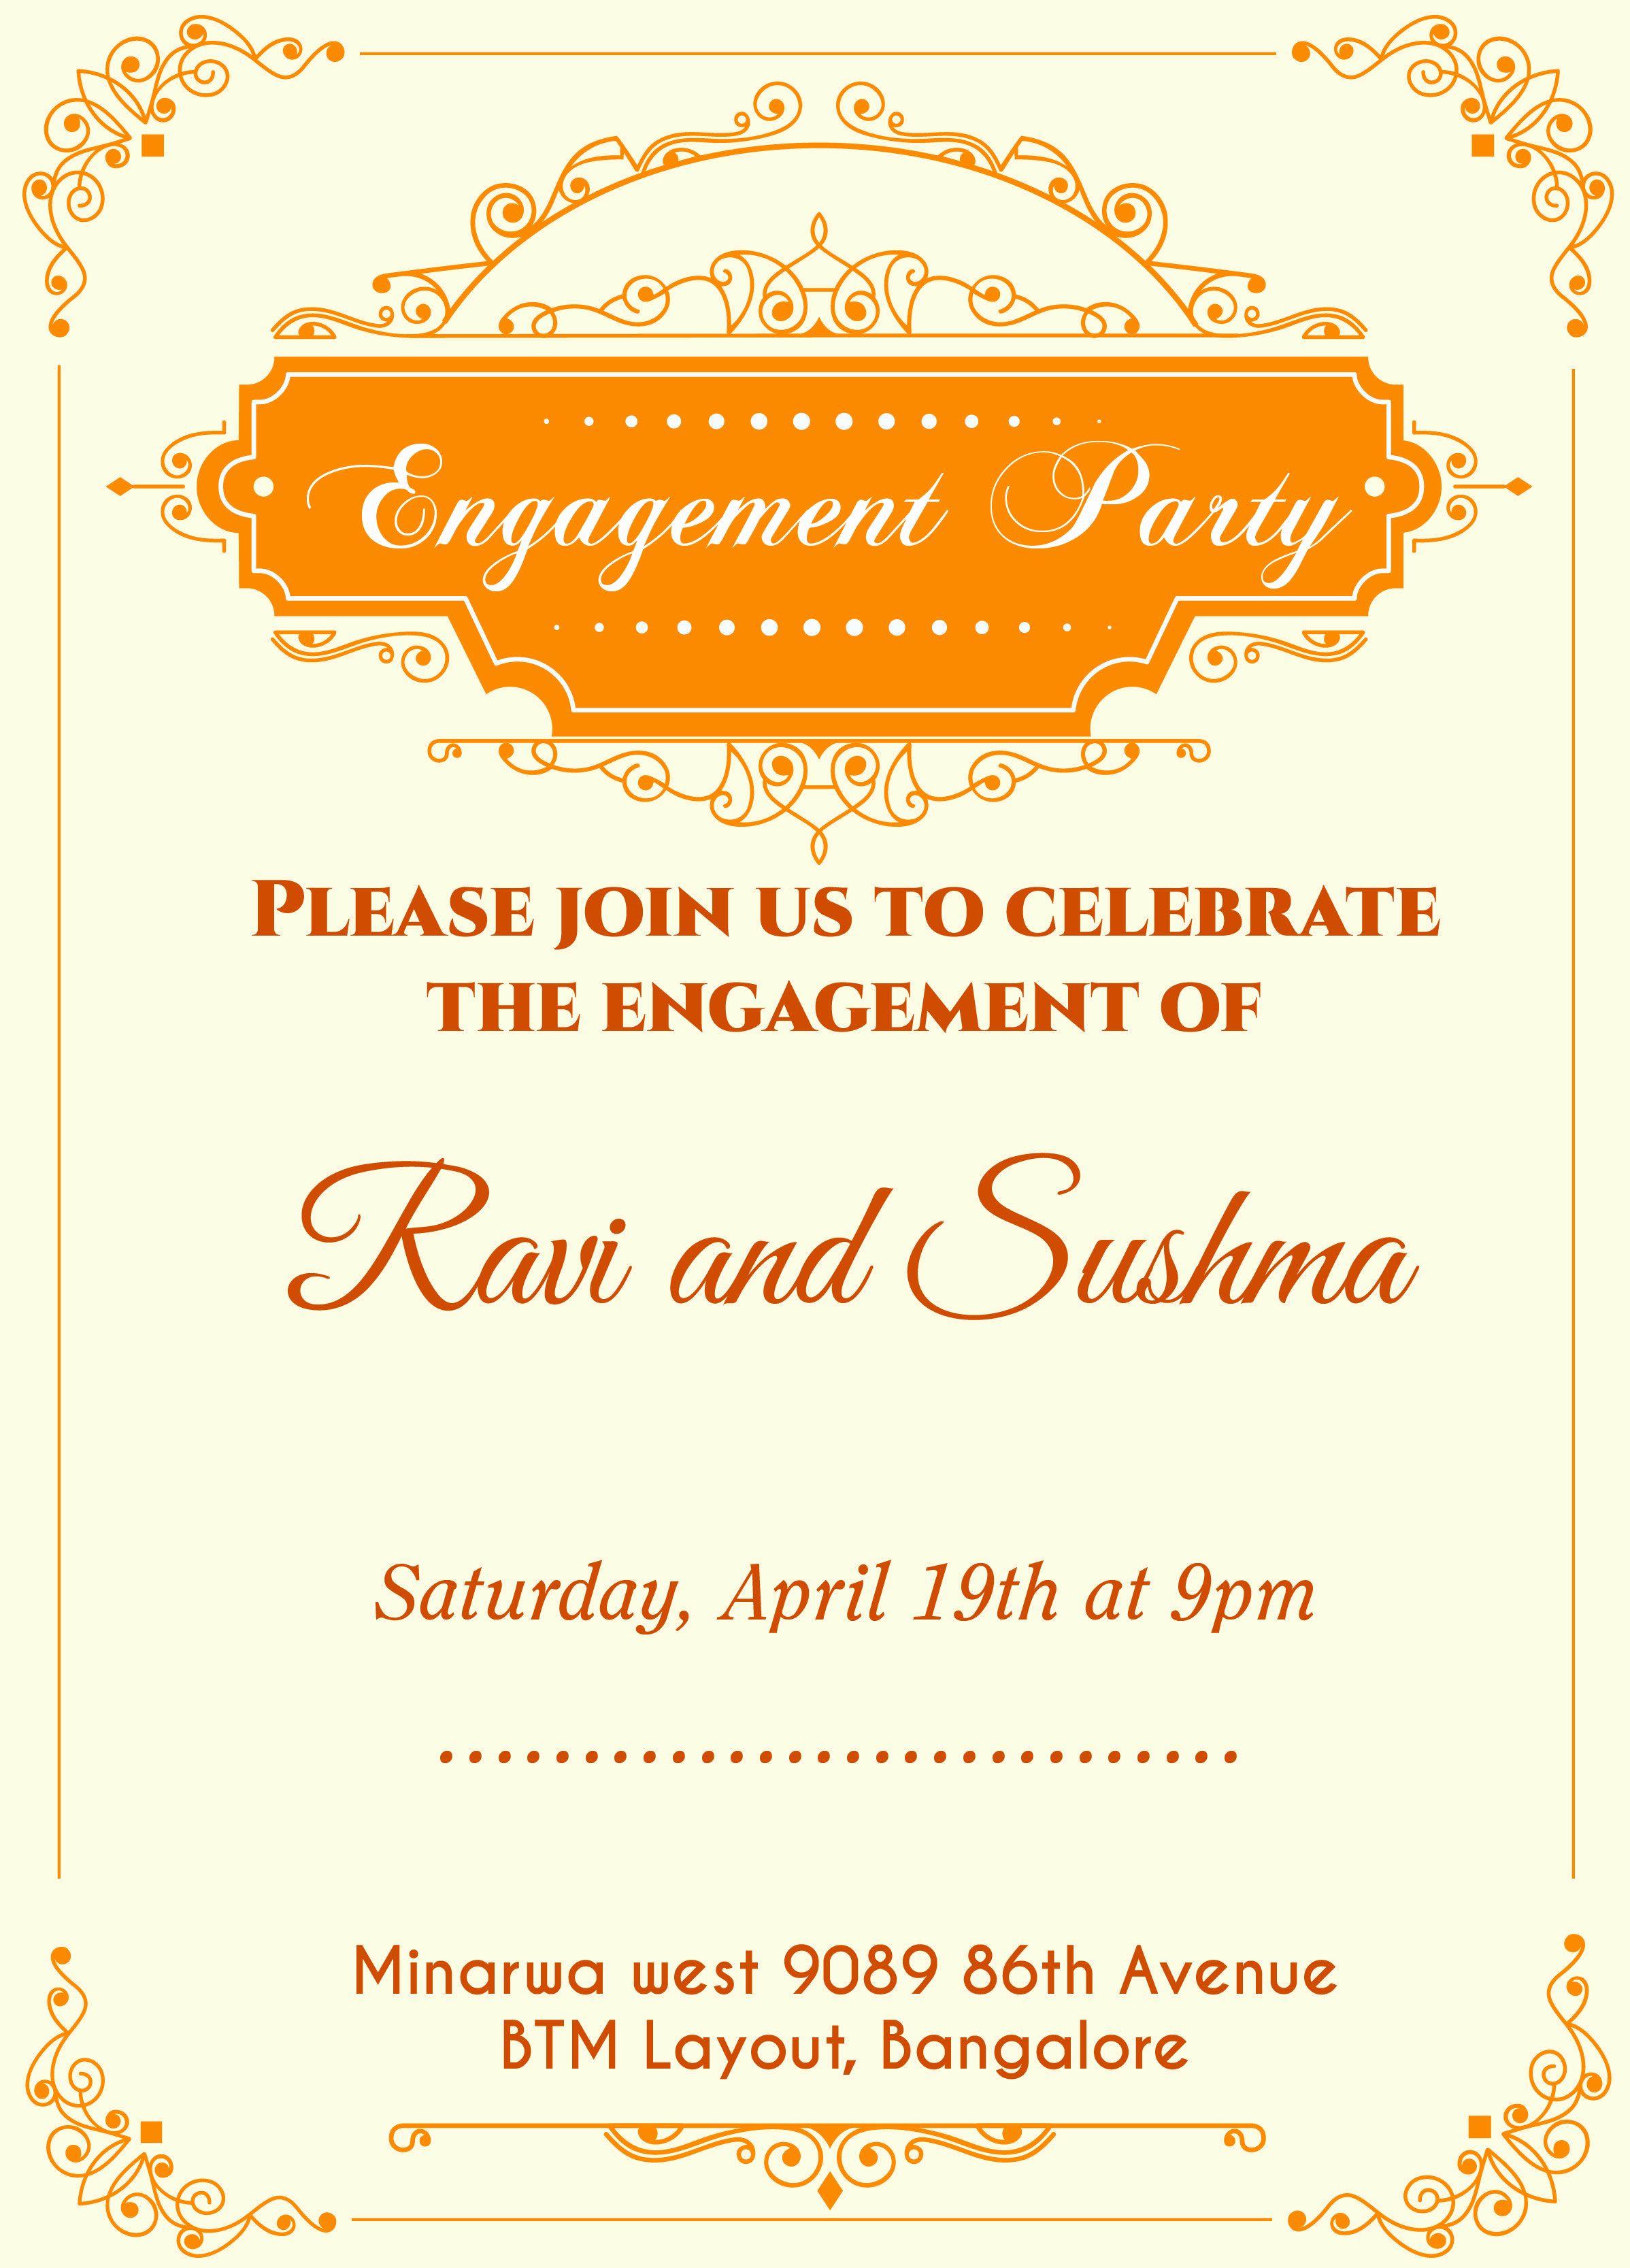 10 New Ideas Engagement Card Invitation Maker Engagement Invitation Cards Engagement Invitation Wording Engagement Invitations